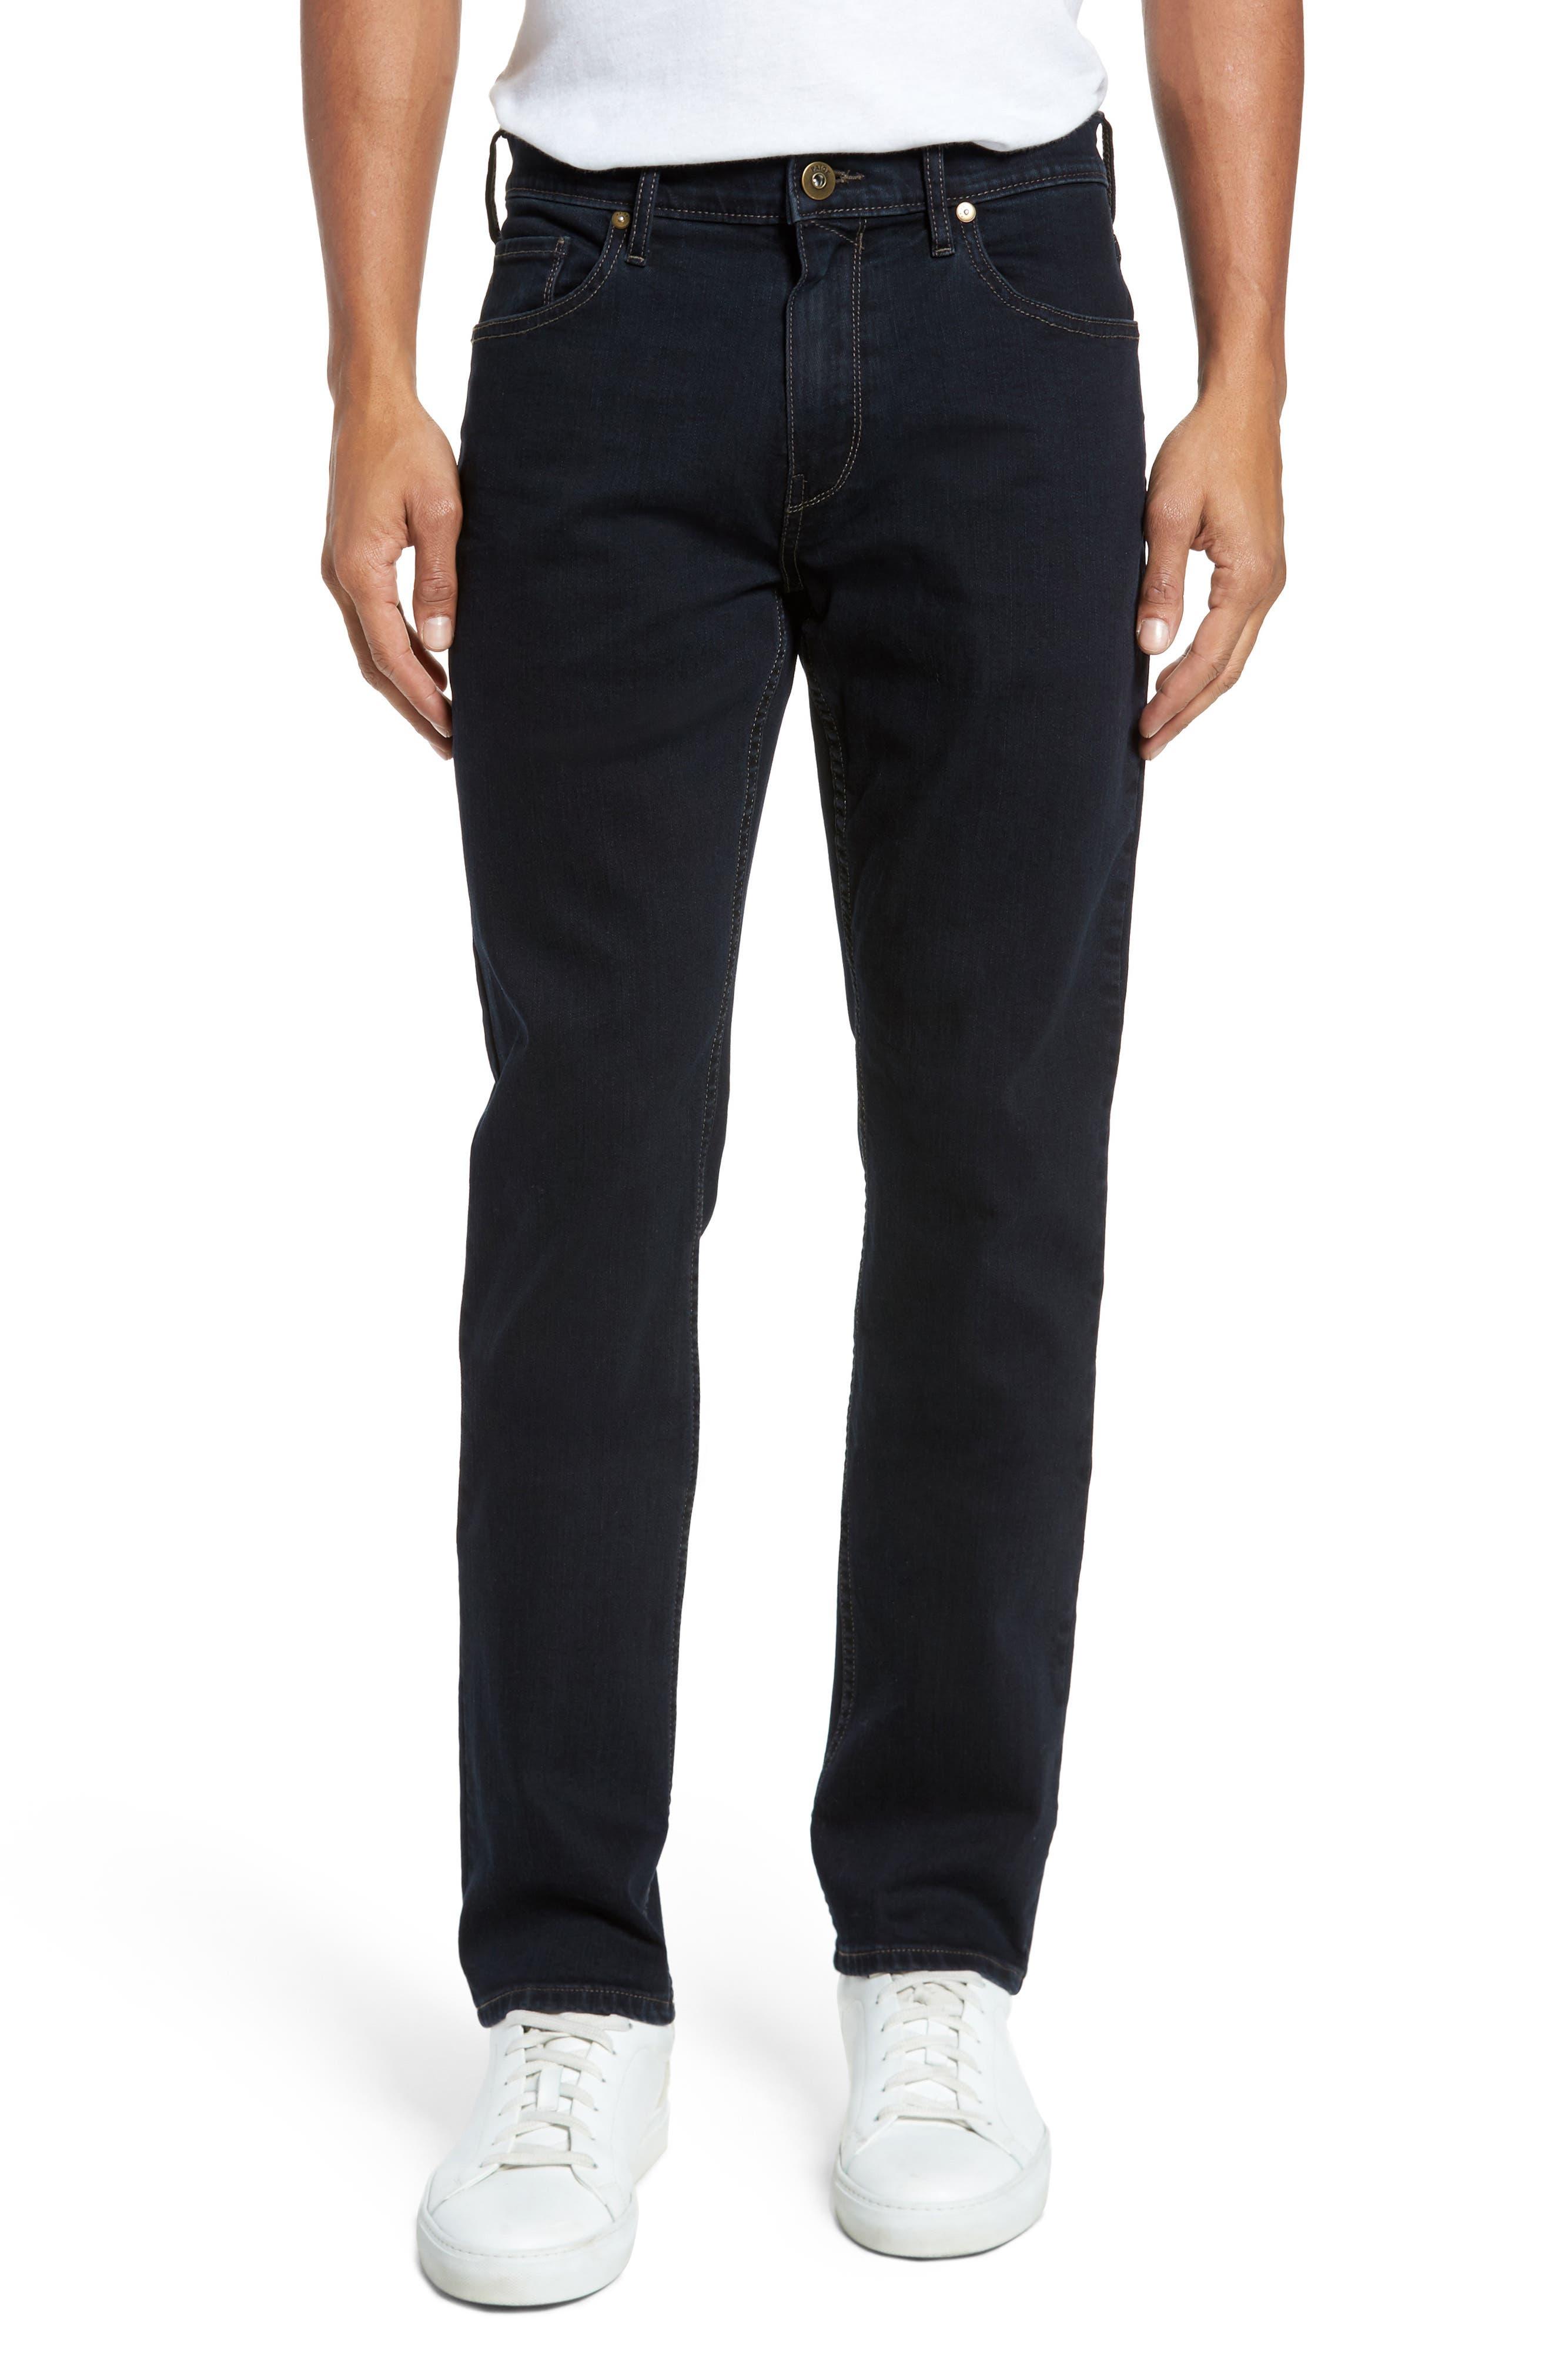 Alternate Image 1 Selected - PAIGE Federal Slim Straight Leg Jeans (Webster)